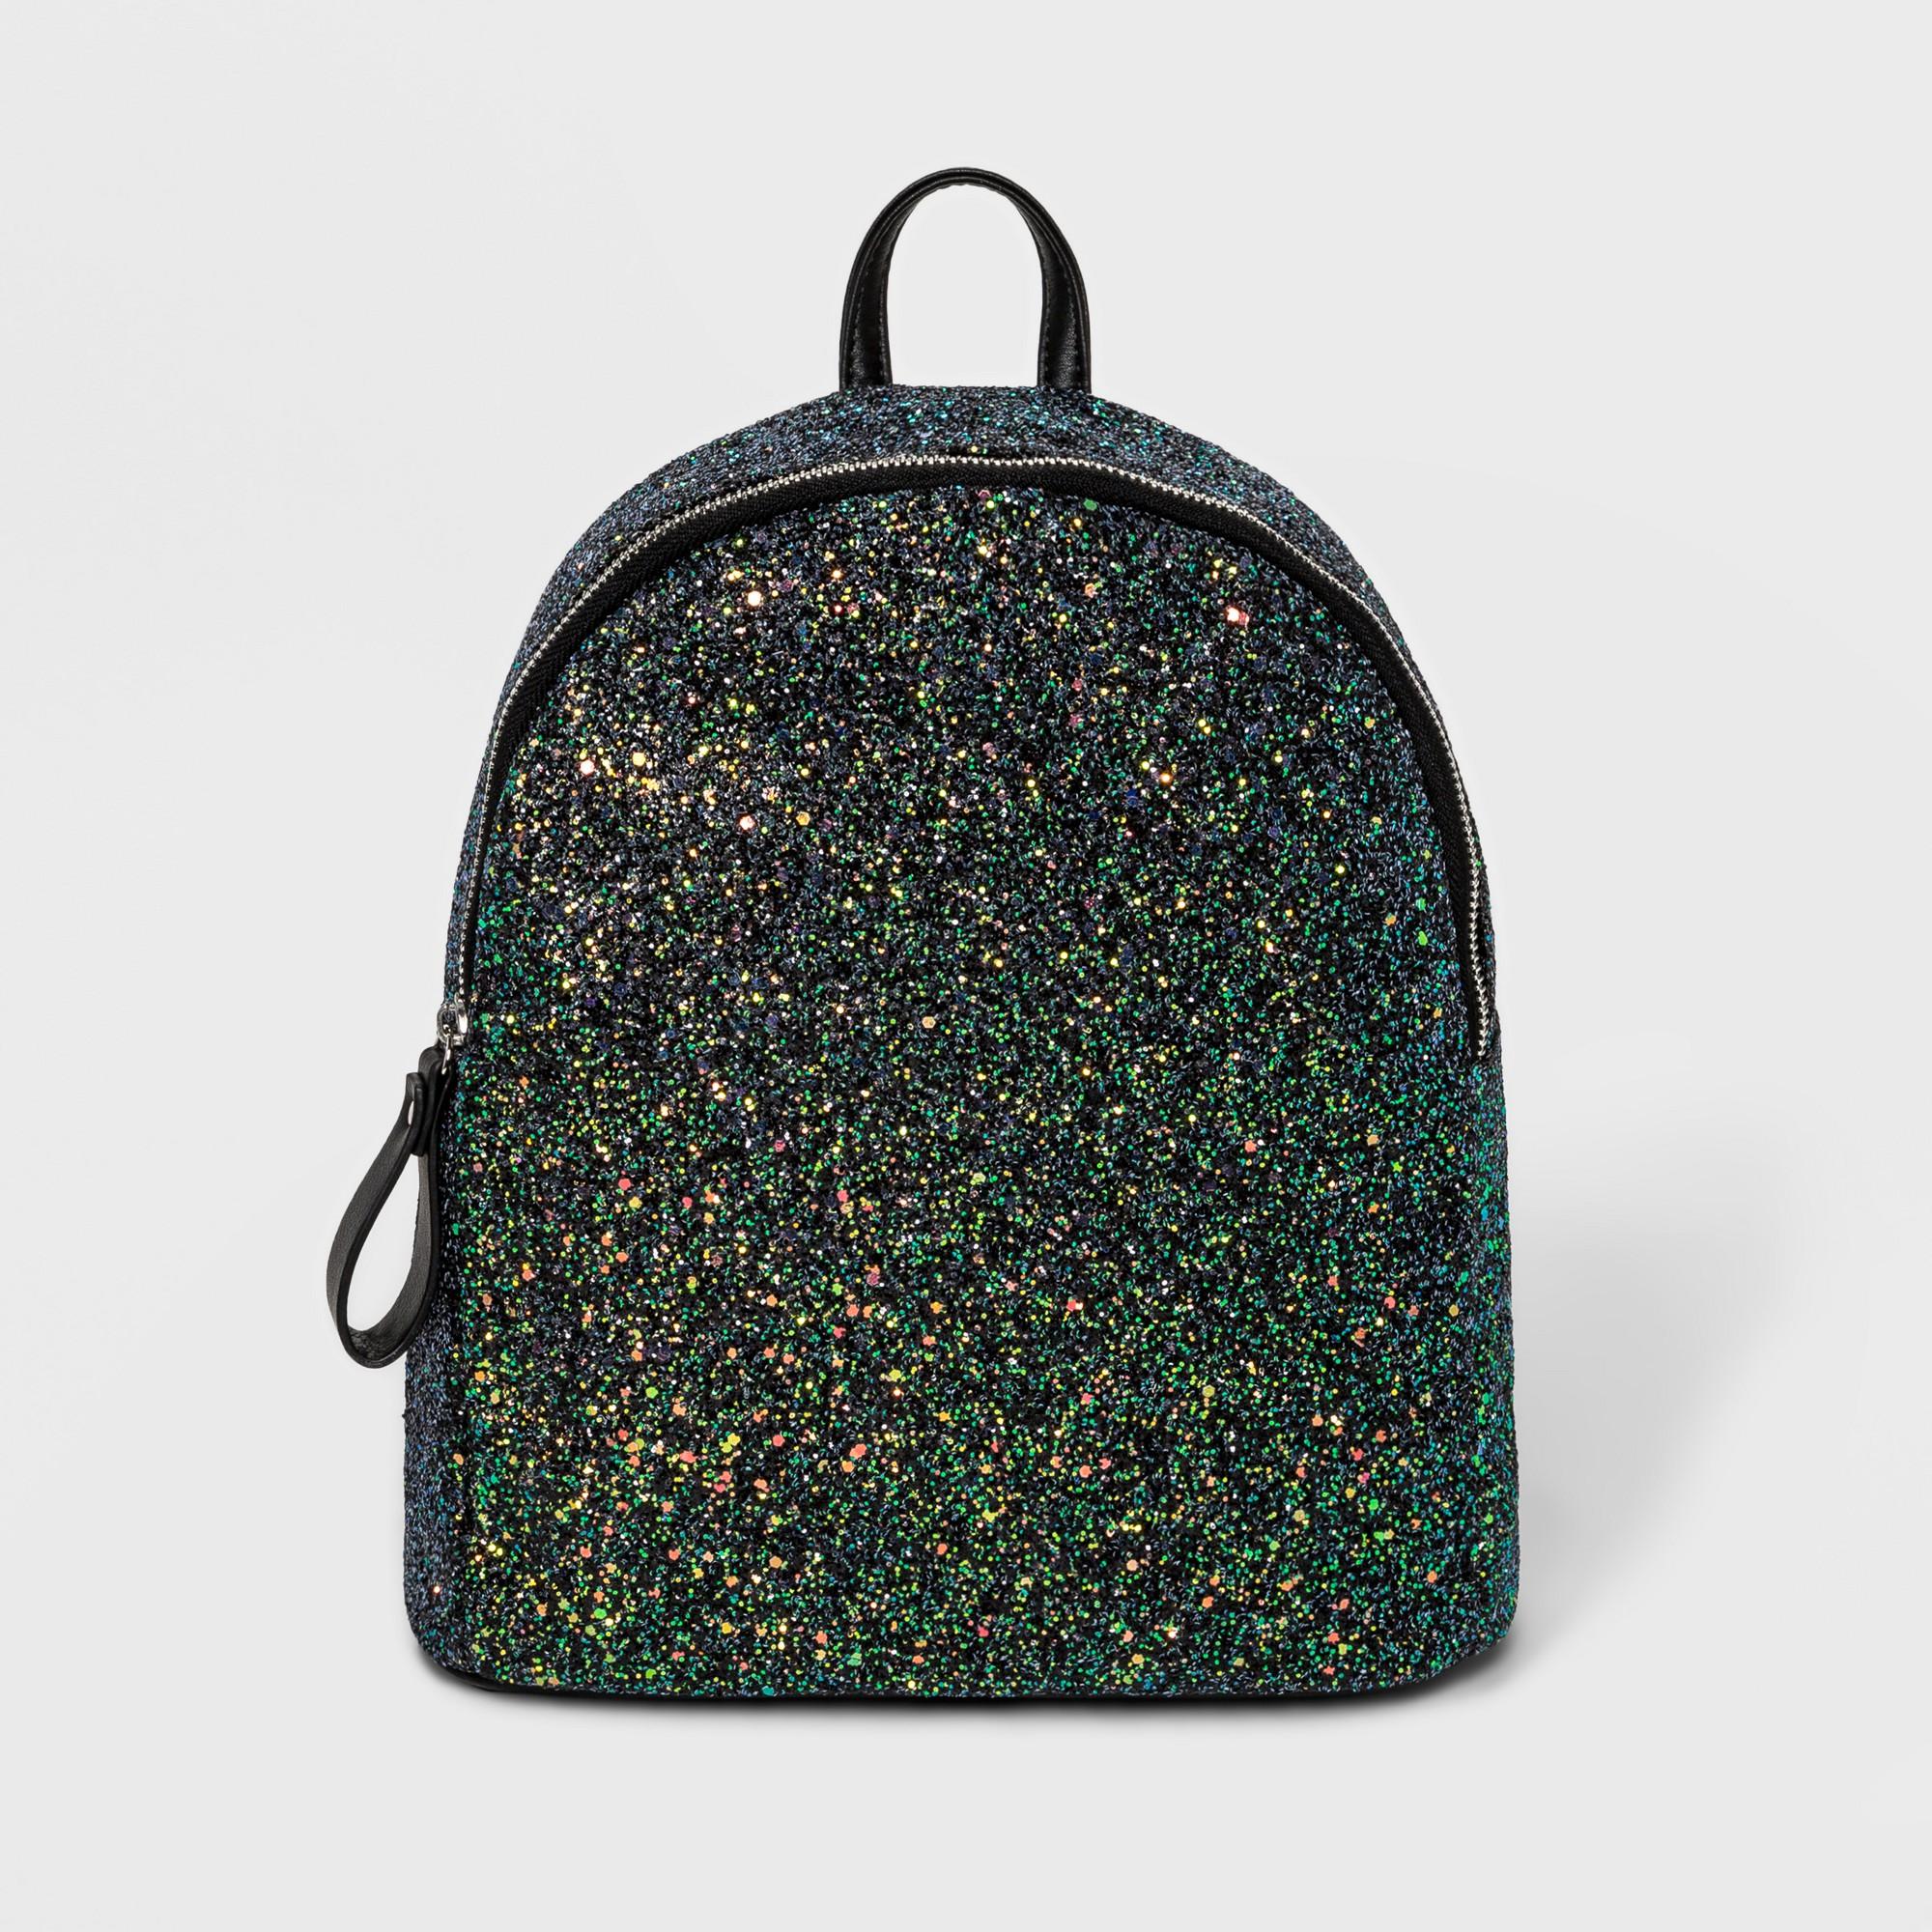 7a2b81a7ac63 Chunky Glitter Backpack - Wild Fable Black